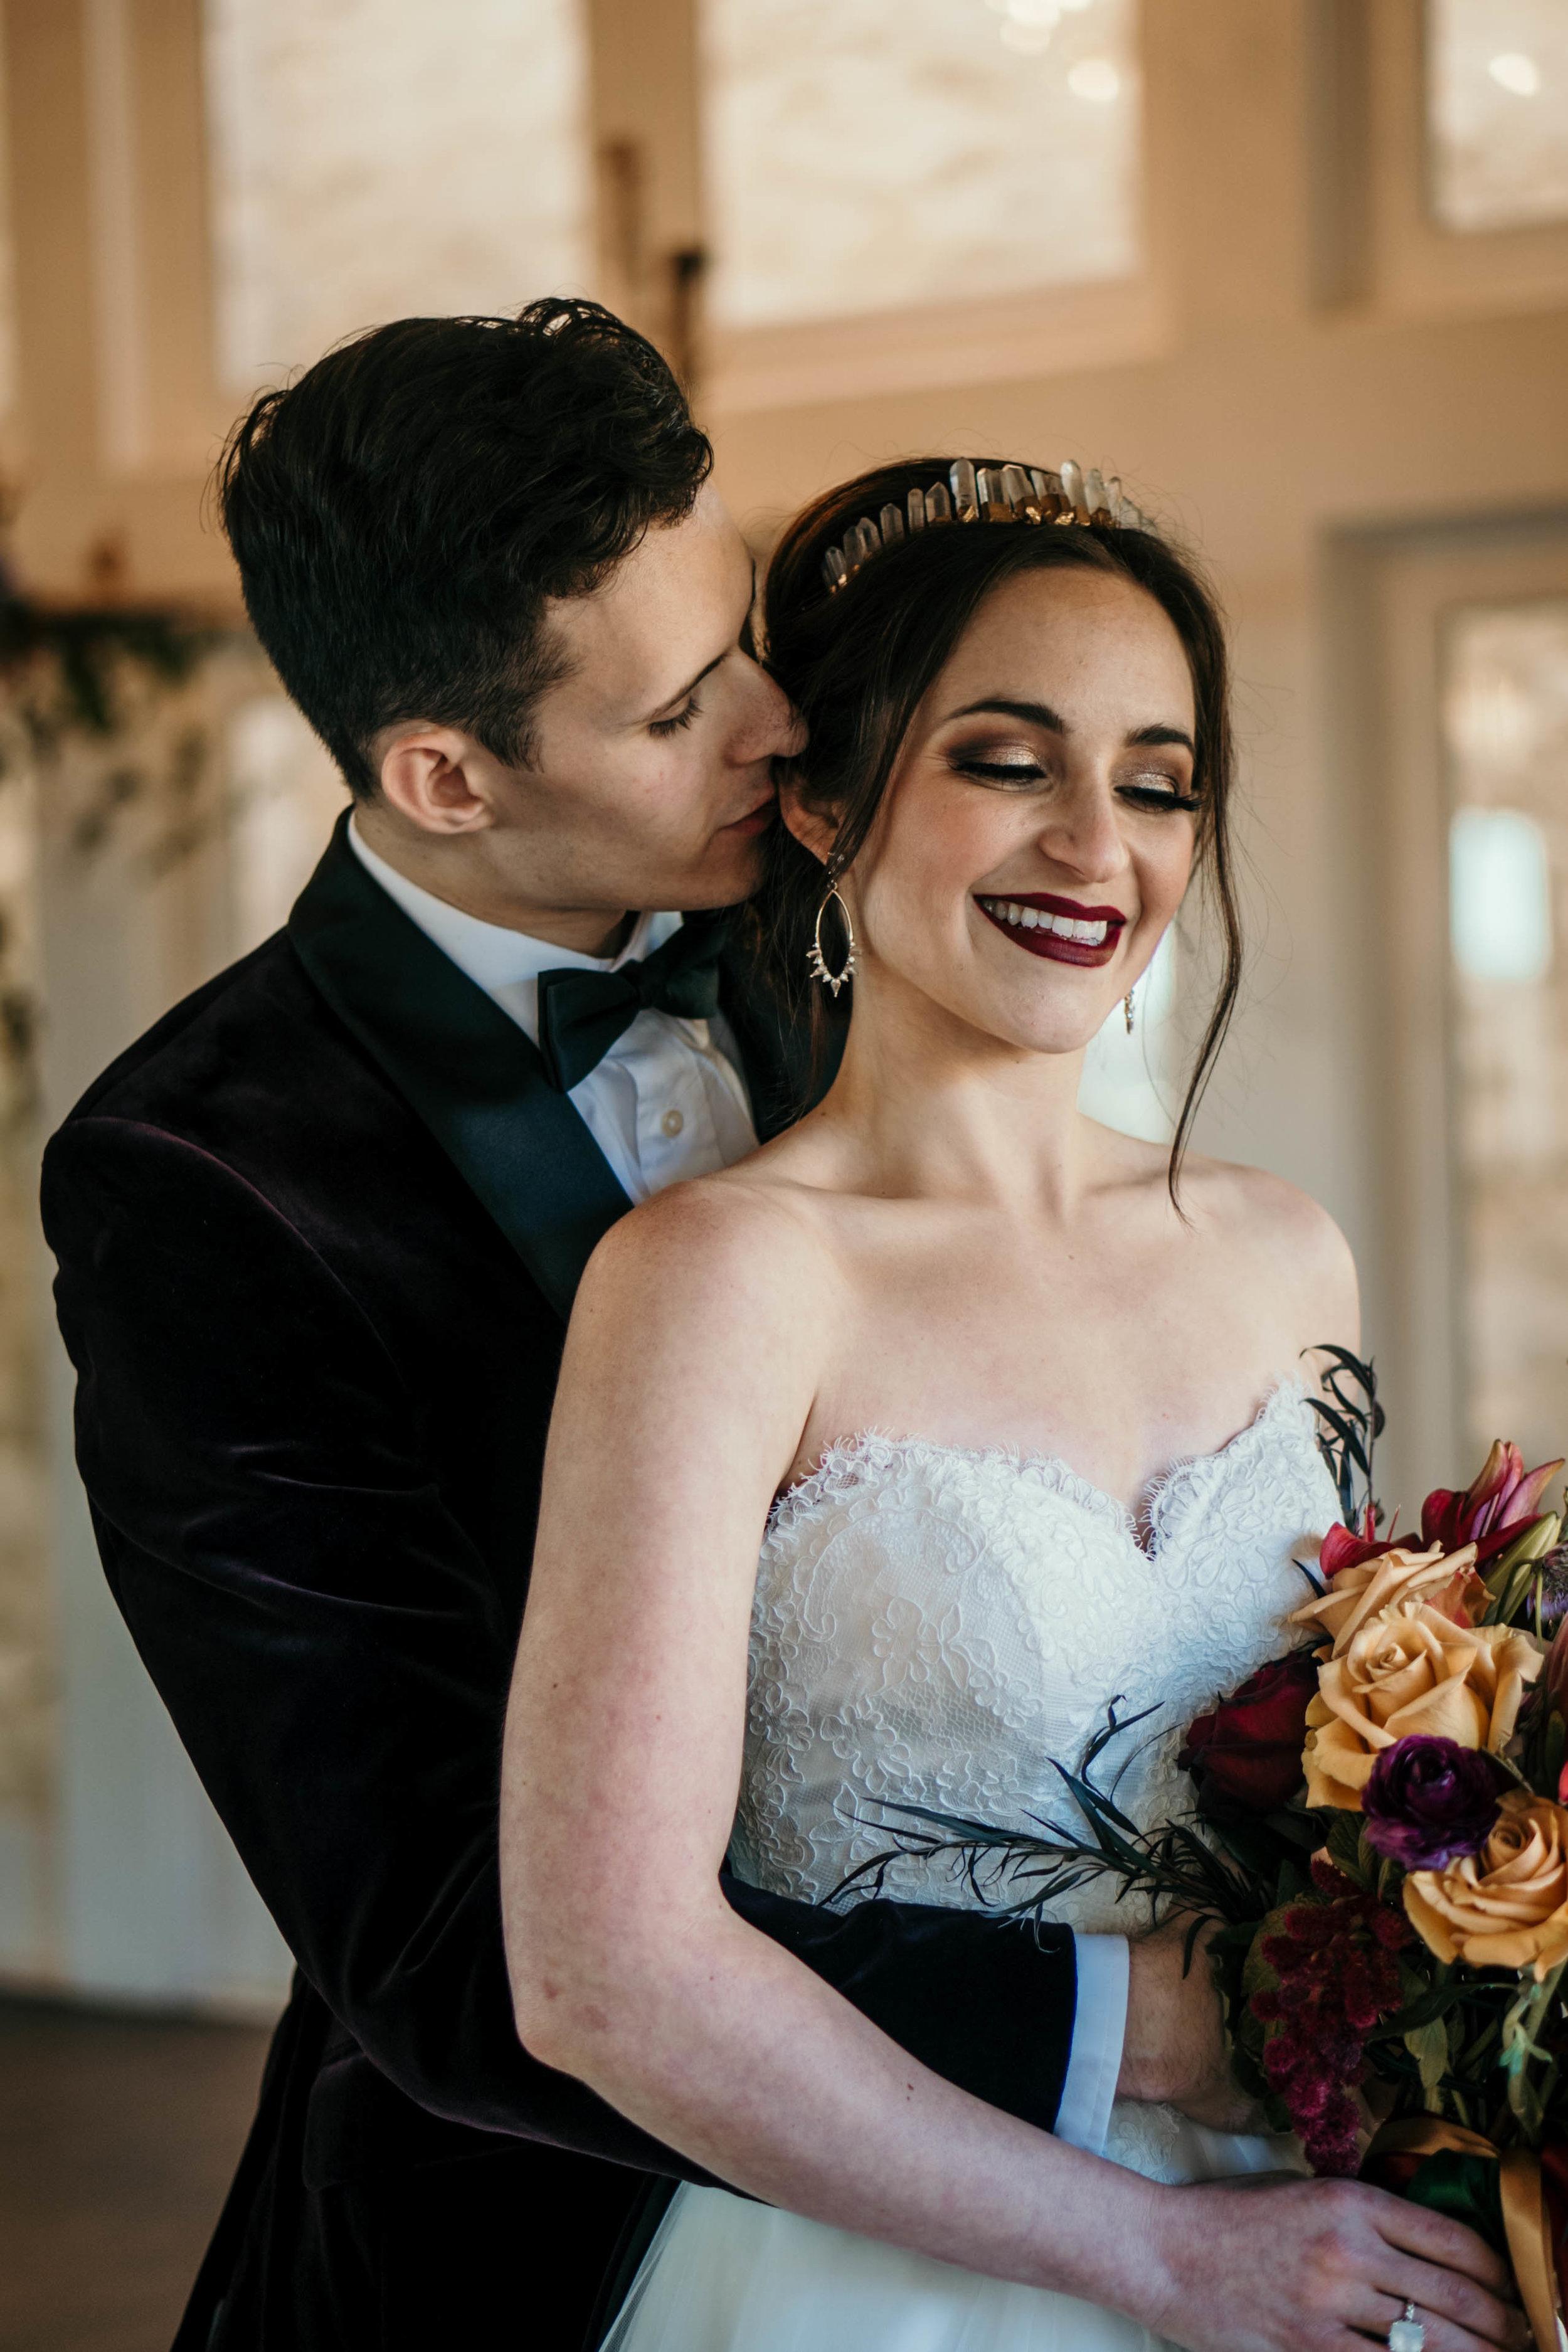 Austin Wedding Videographer - Dolls for Dolls (321 of 323).jpg